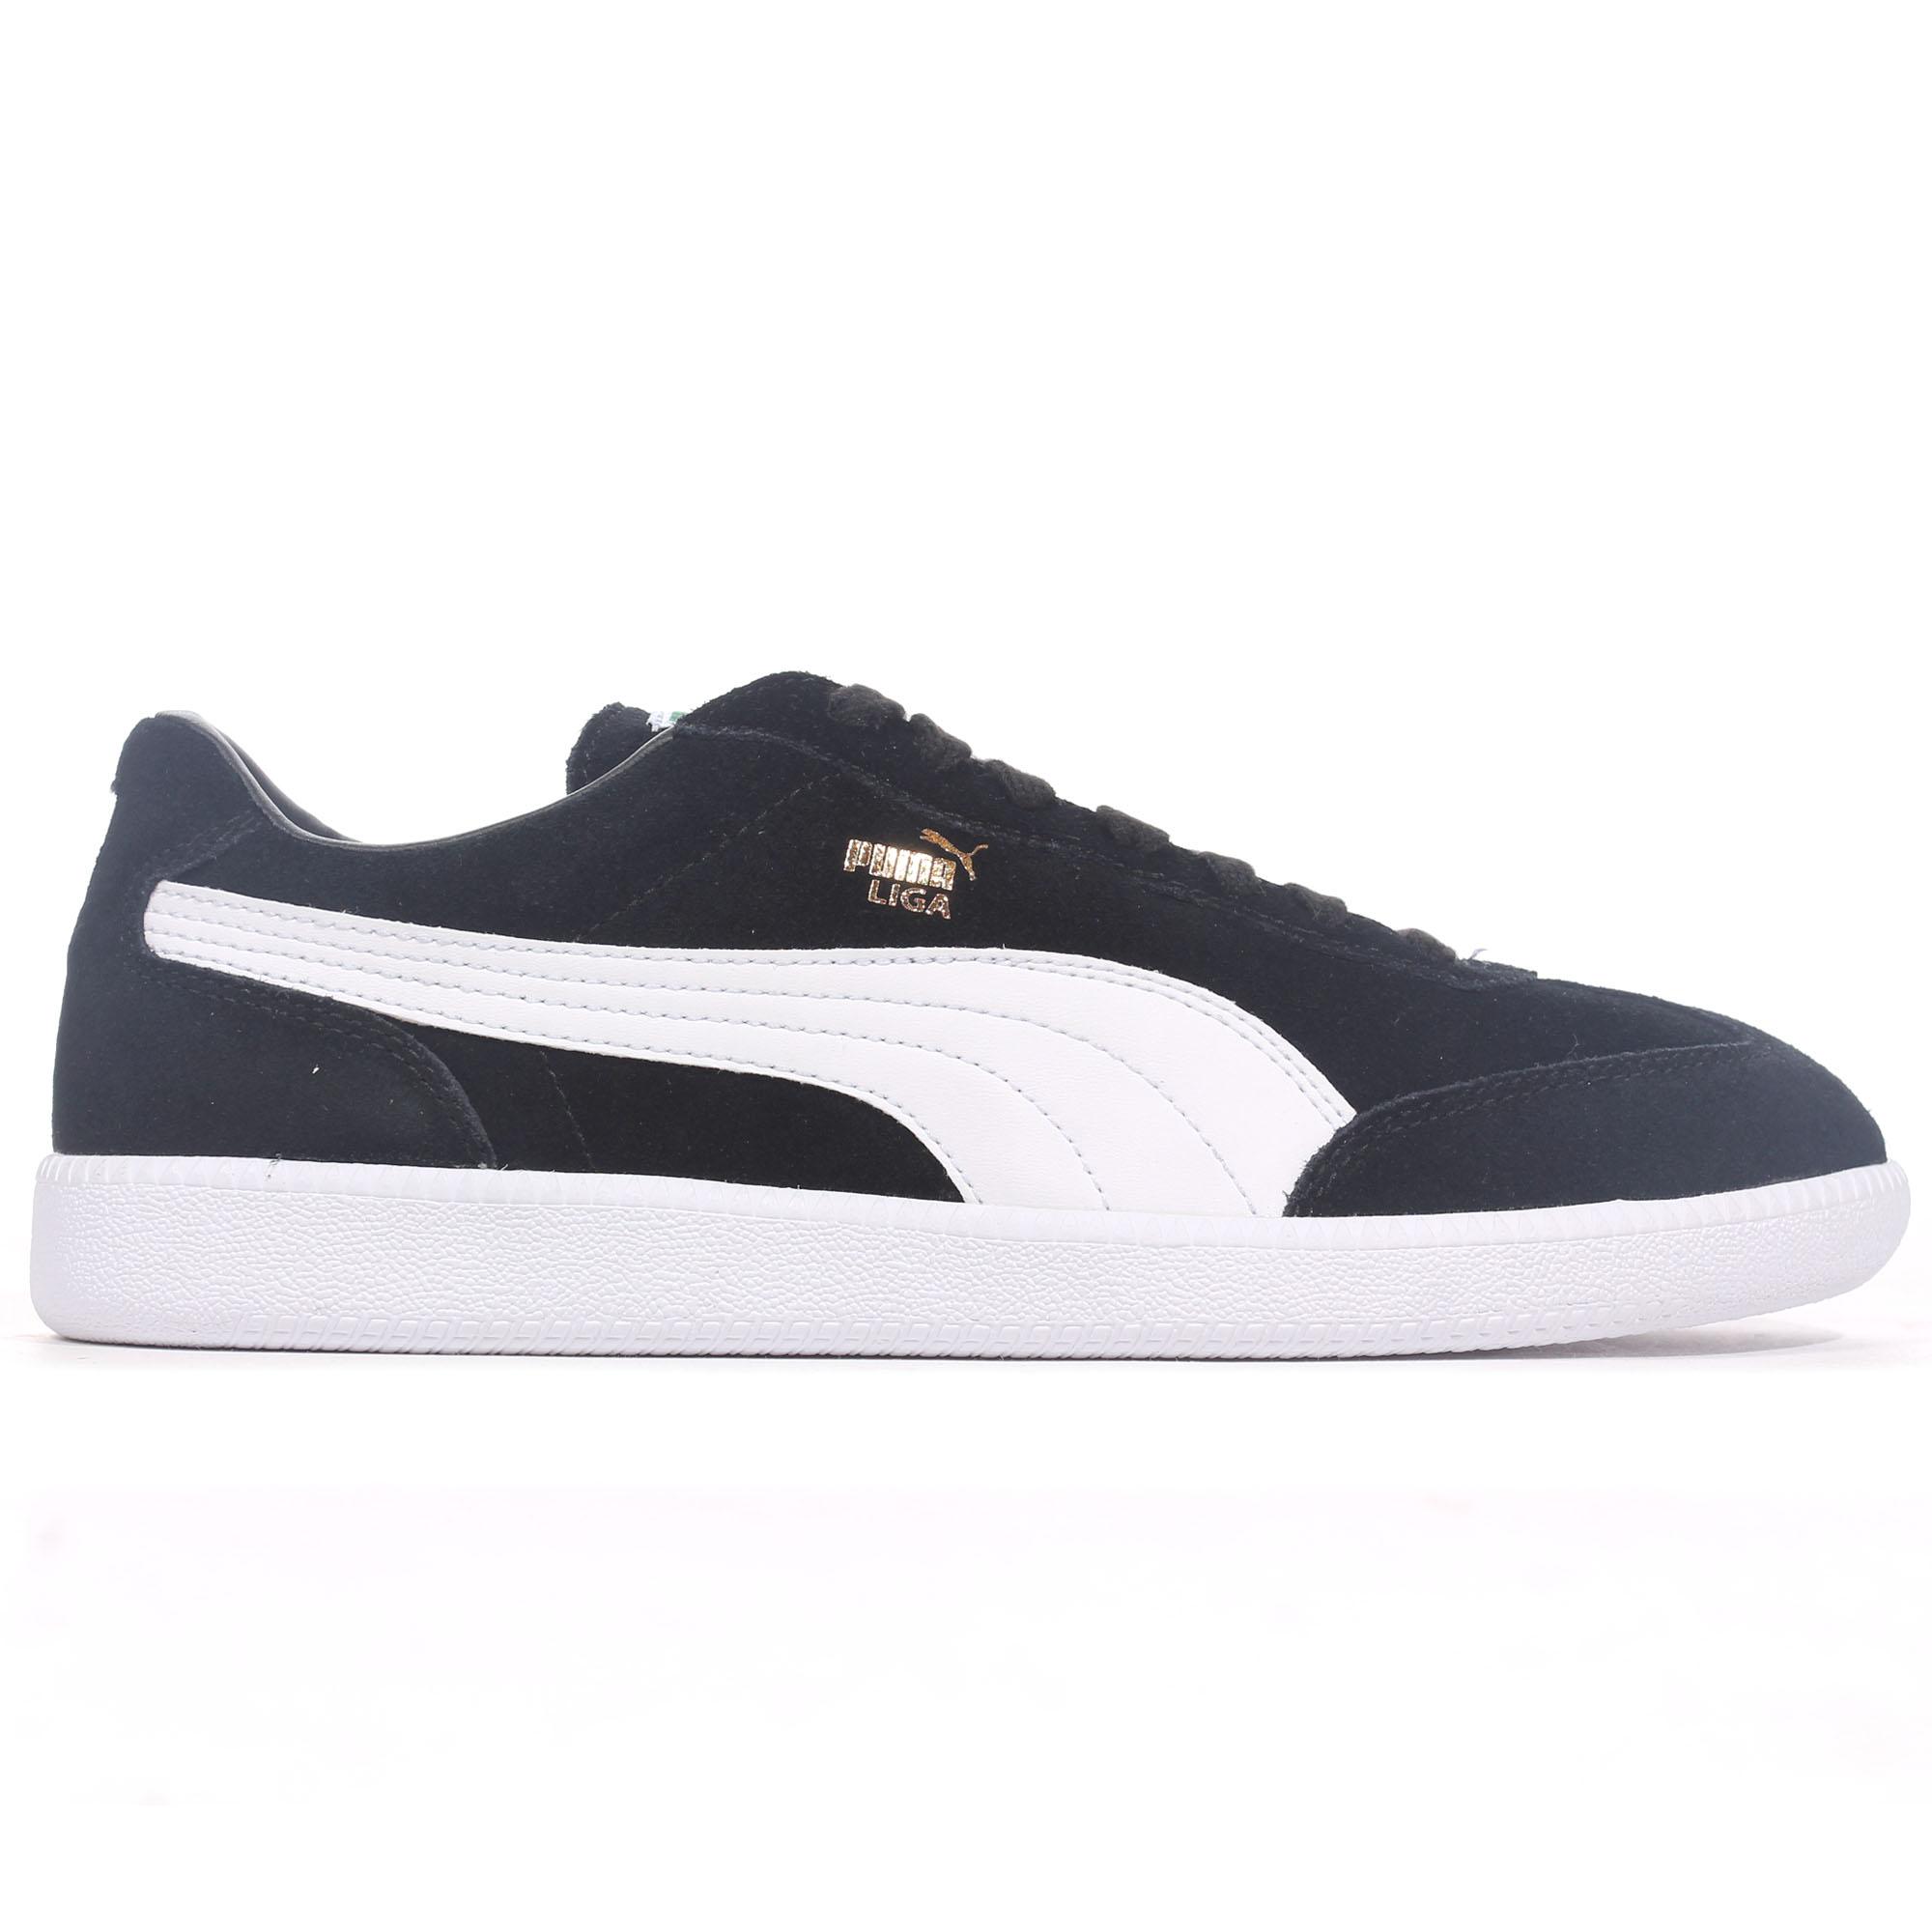 1691e3d55e3 Details about Puma Liga Suede Mens Football Terrace Fashion Trainer Shoe  Black/White